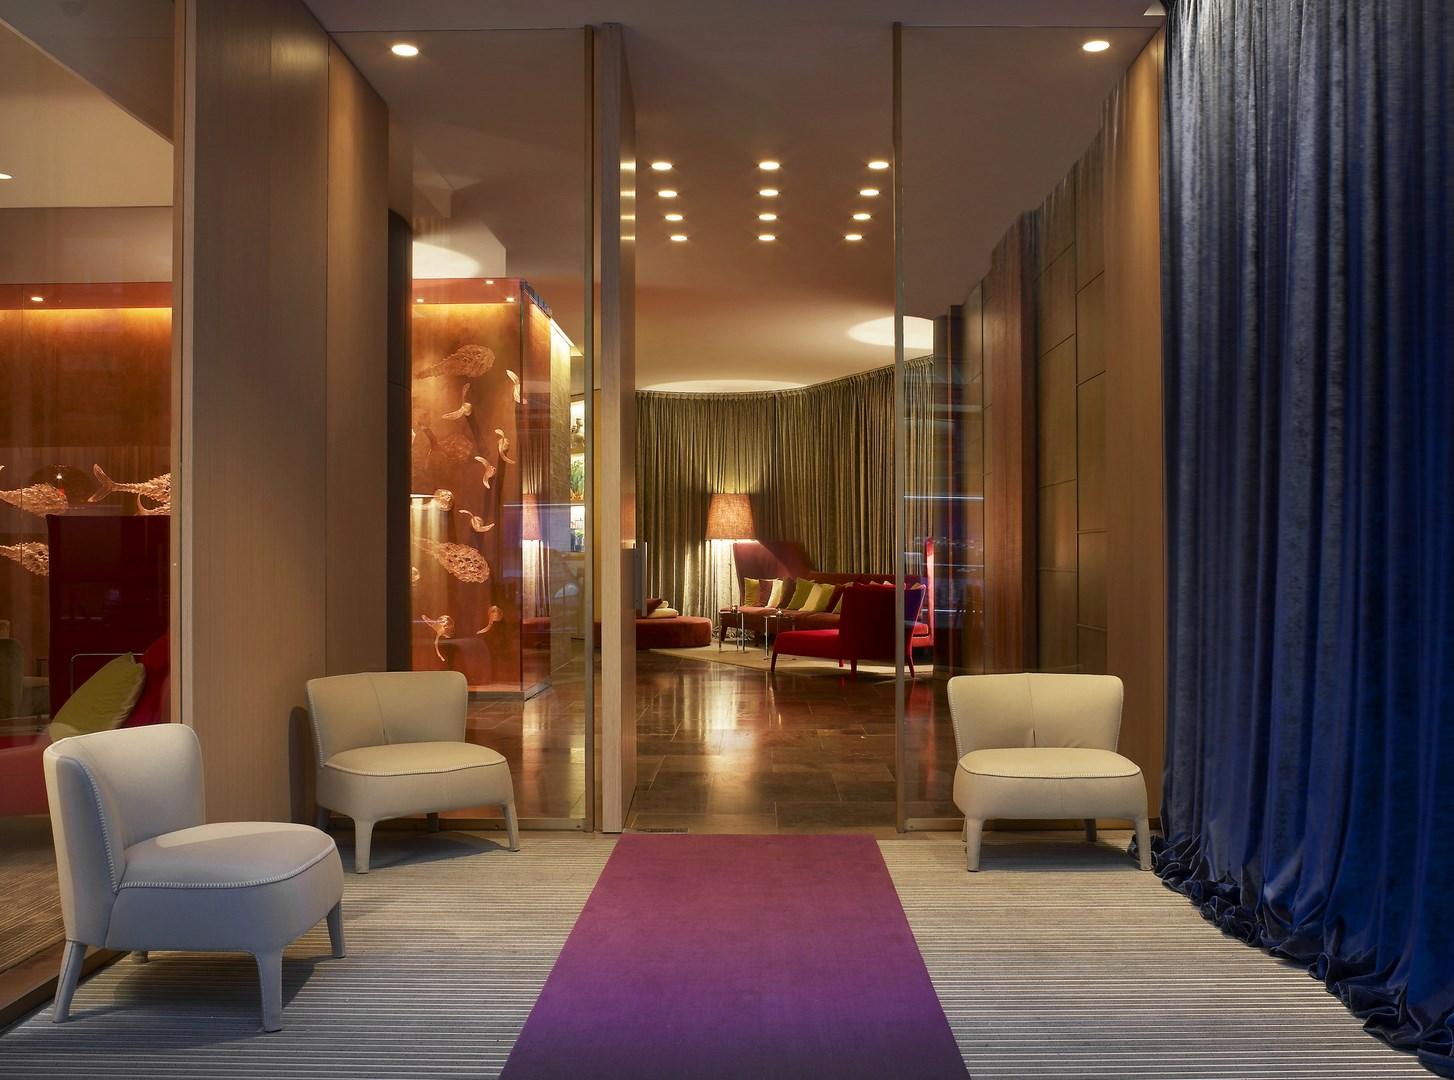 russland-st-petersburg-w-hotel-lobby